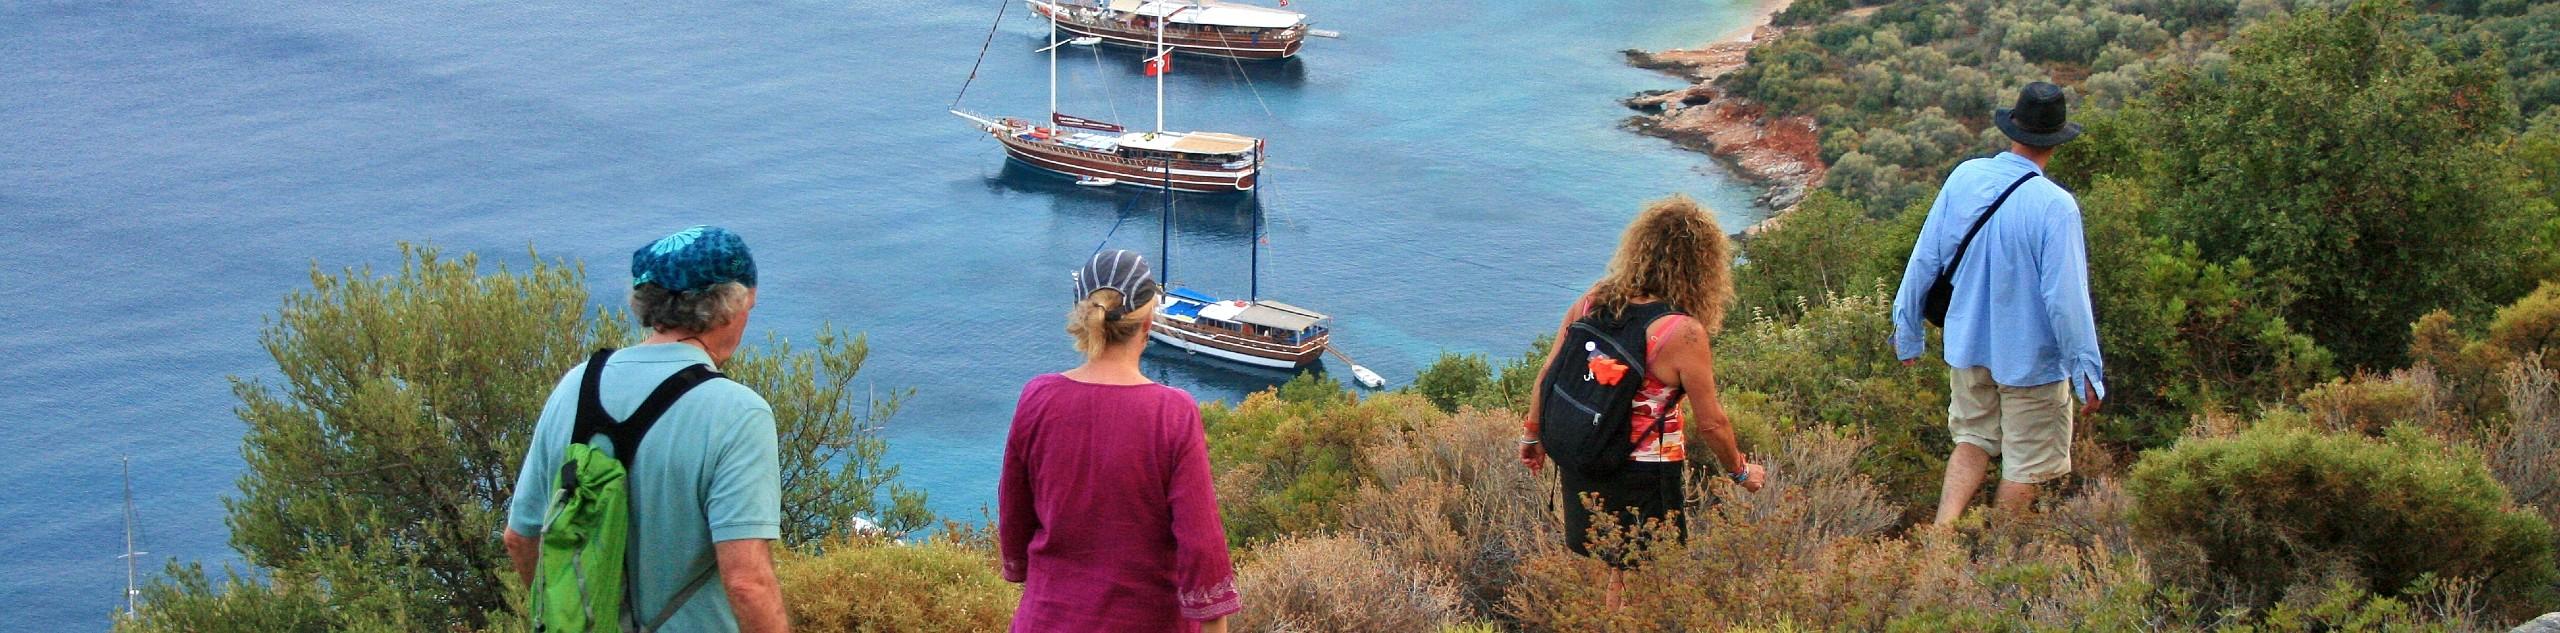 Turkey's Turquoise Coast Hiking and Sailing